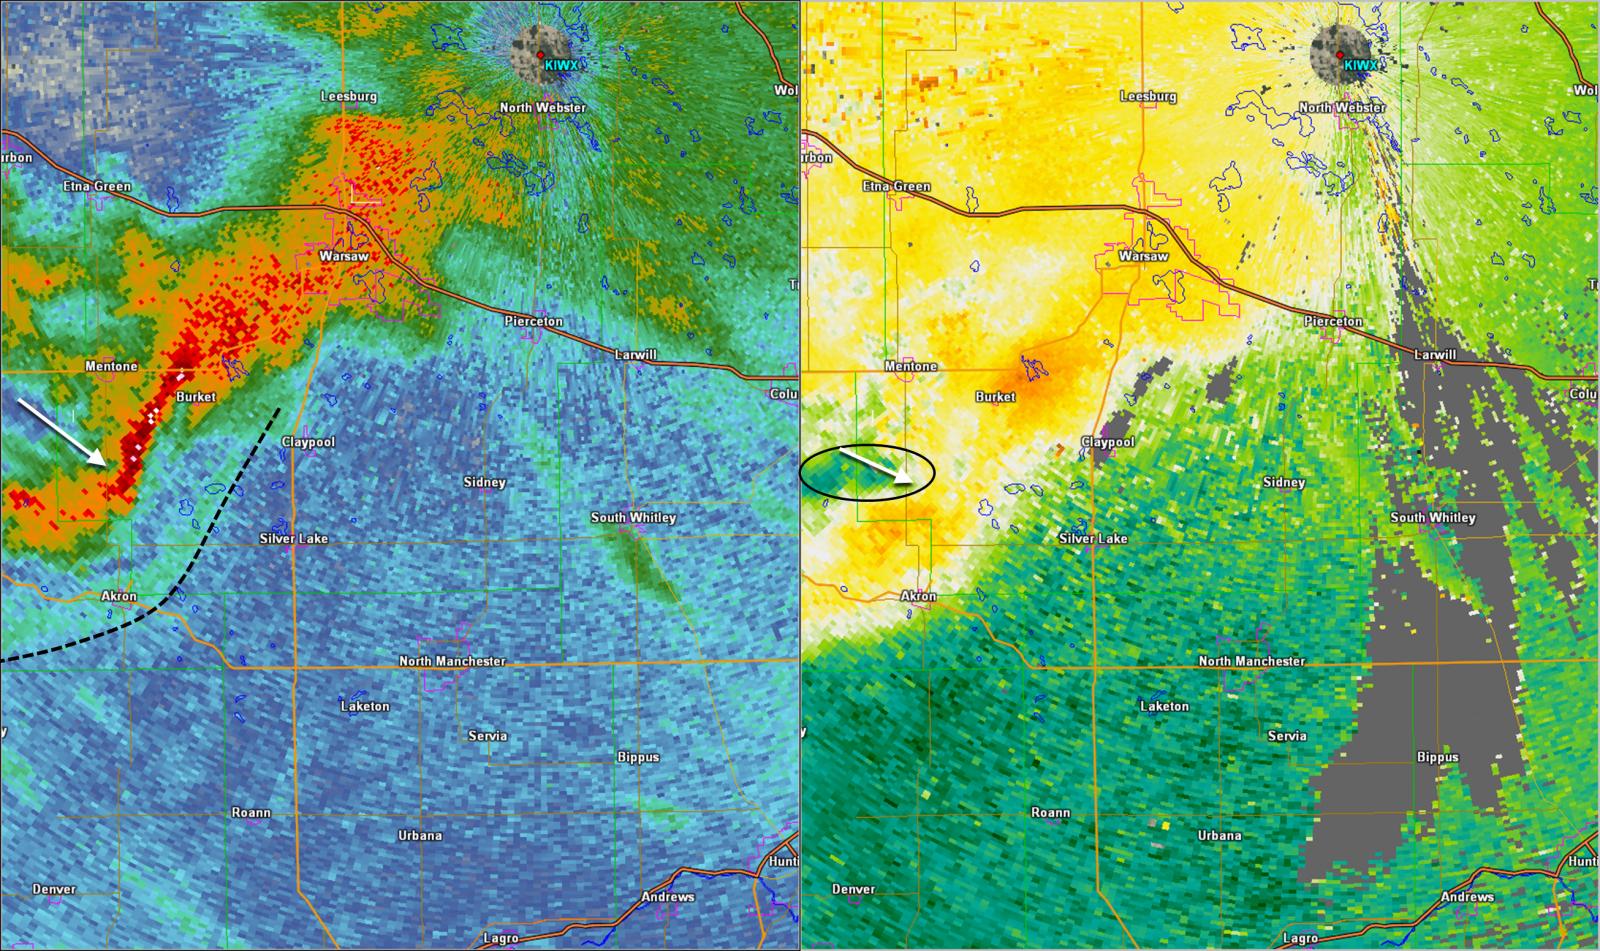 1001 pm EDT 0.5 degree radar reflectivity